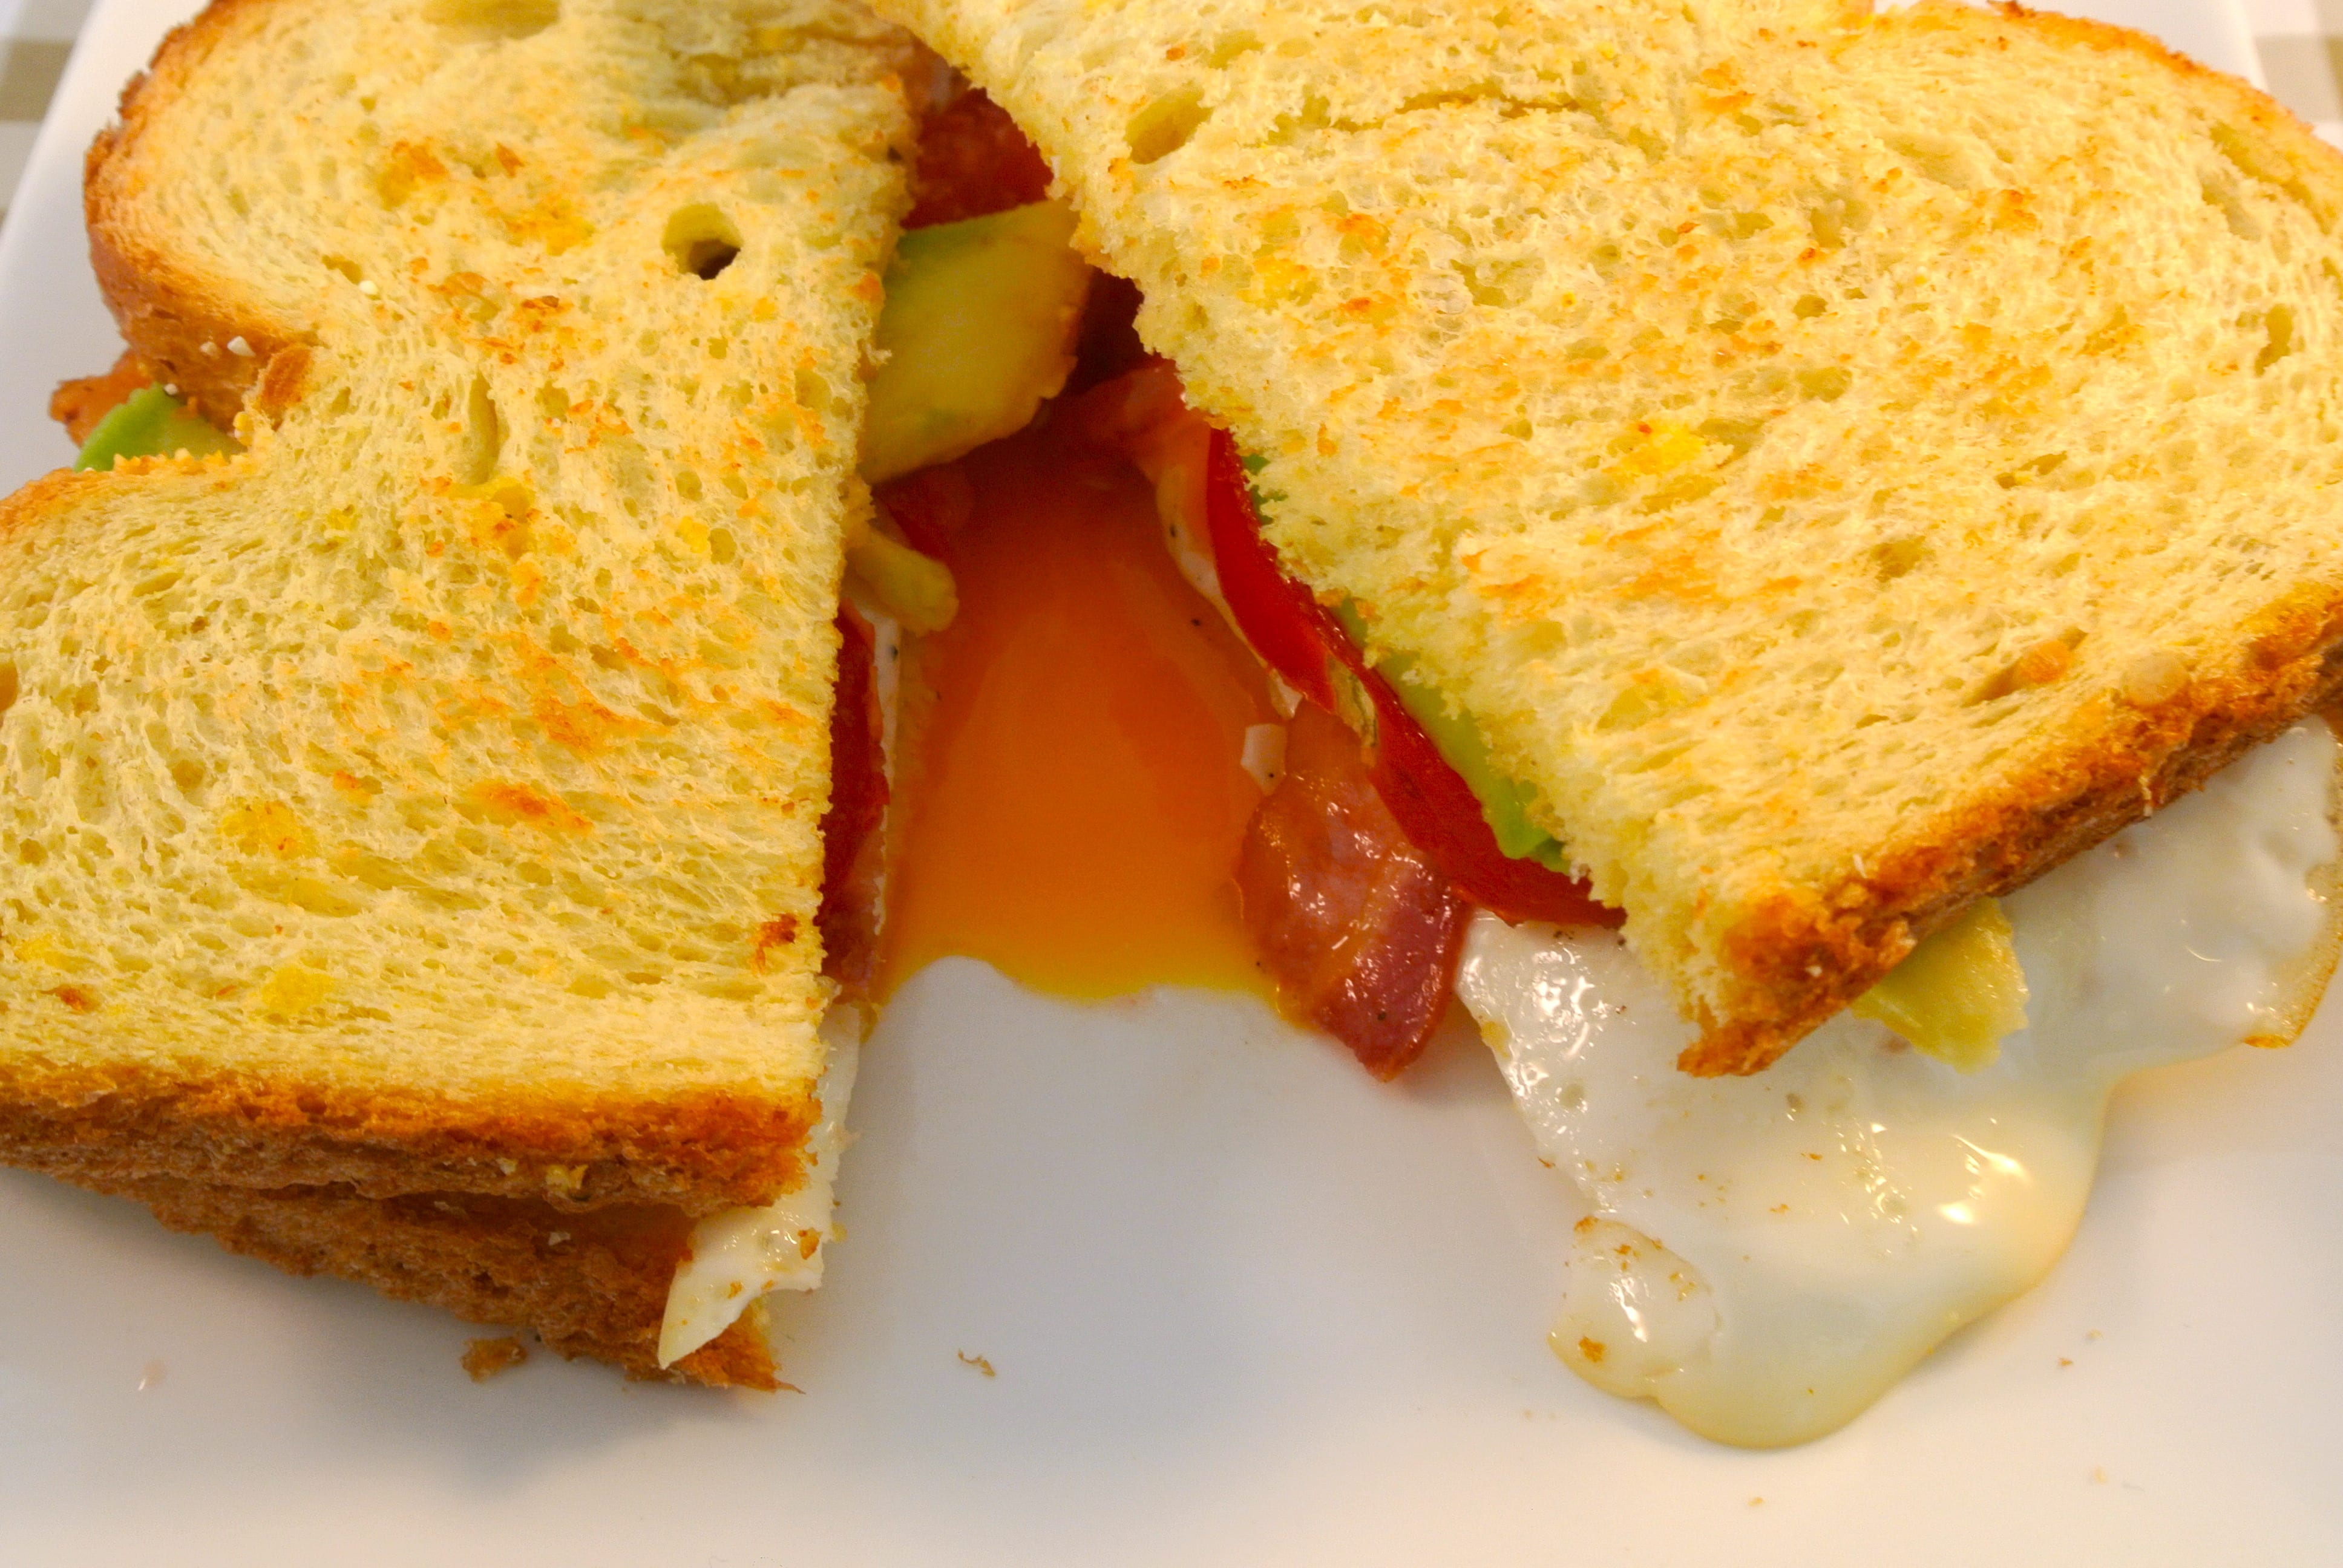 Lekkere lunch: sandwich met ei, tomaat, avocado en ontbijtspek